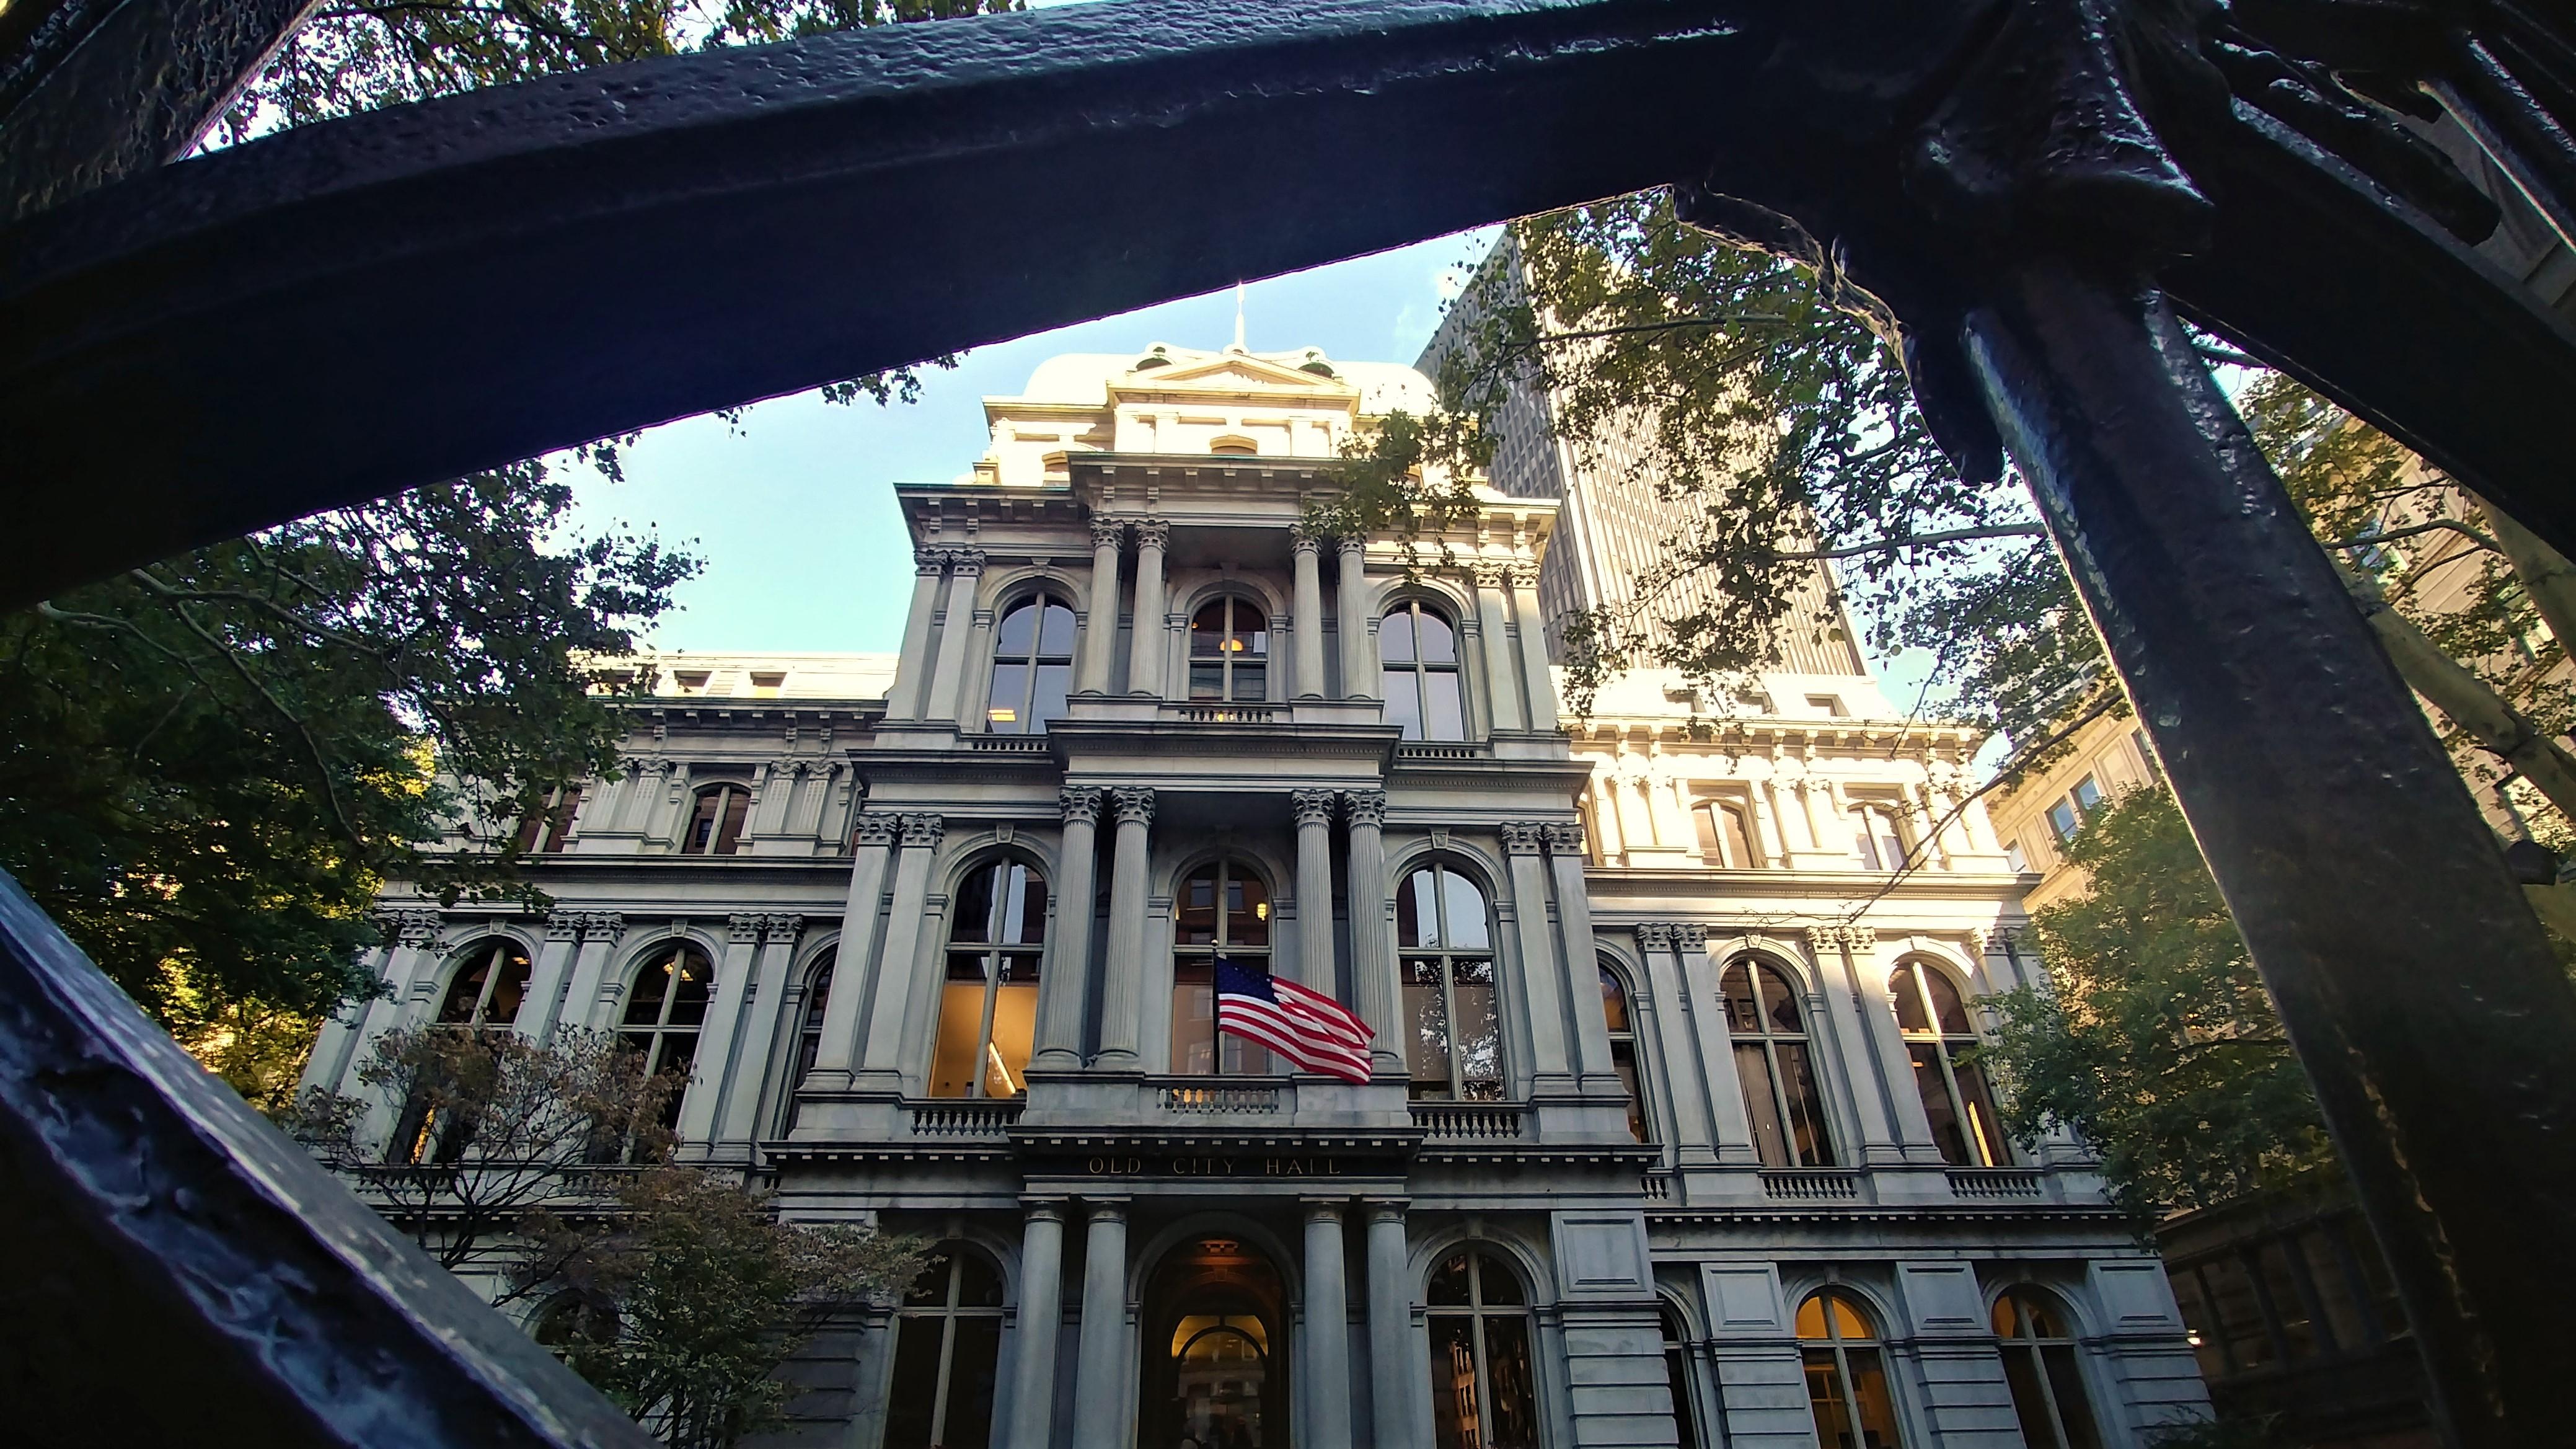 boston old city hall usa road-trip blog voyage